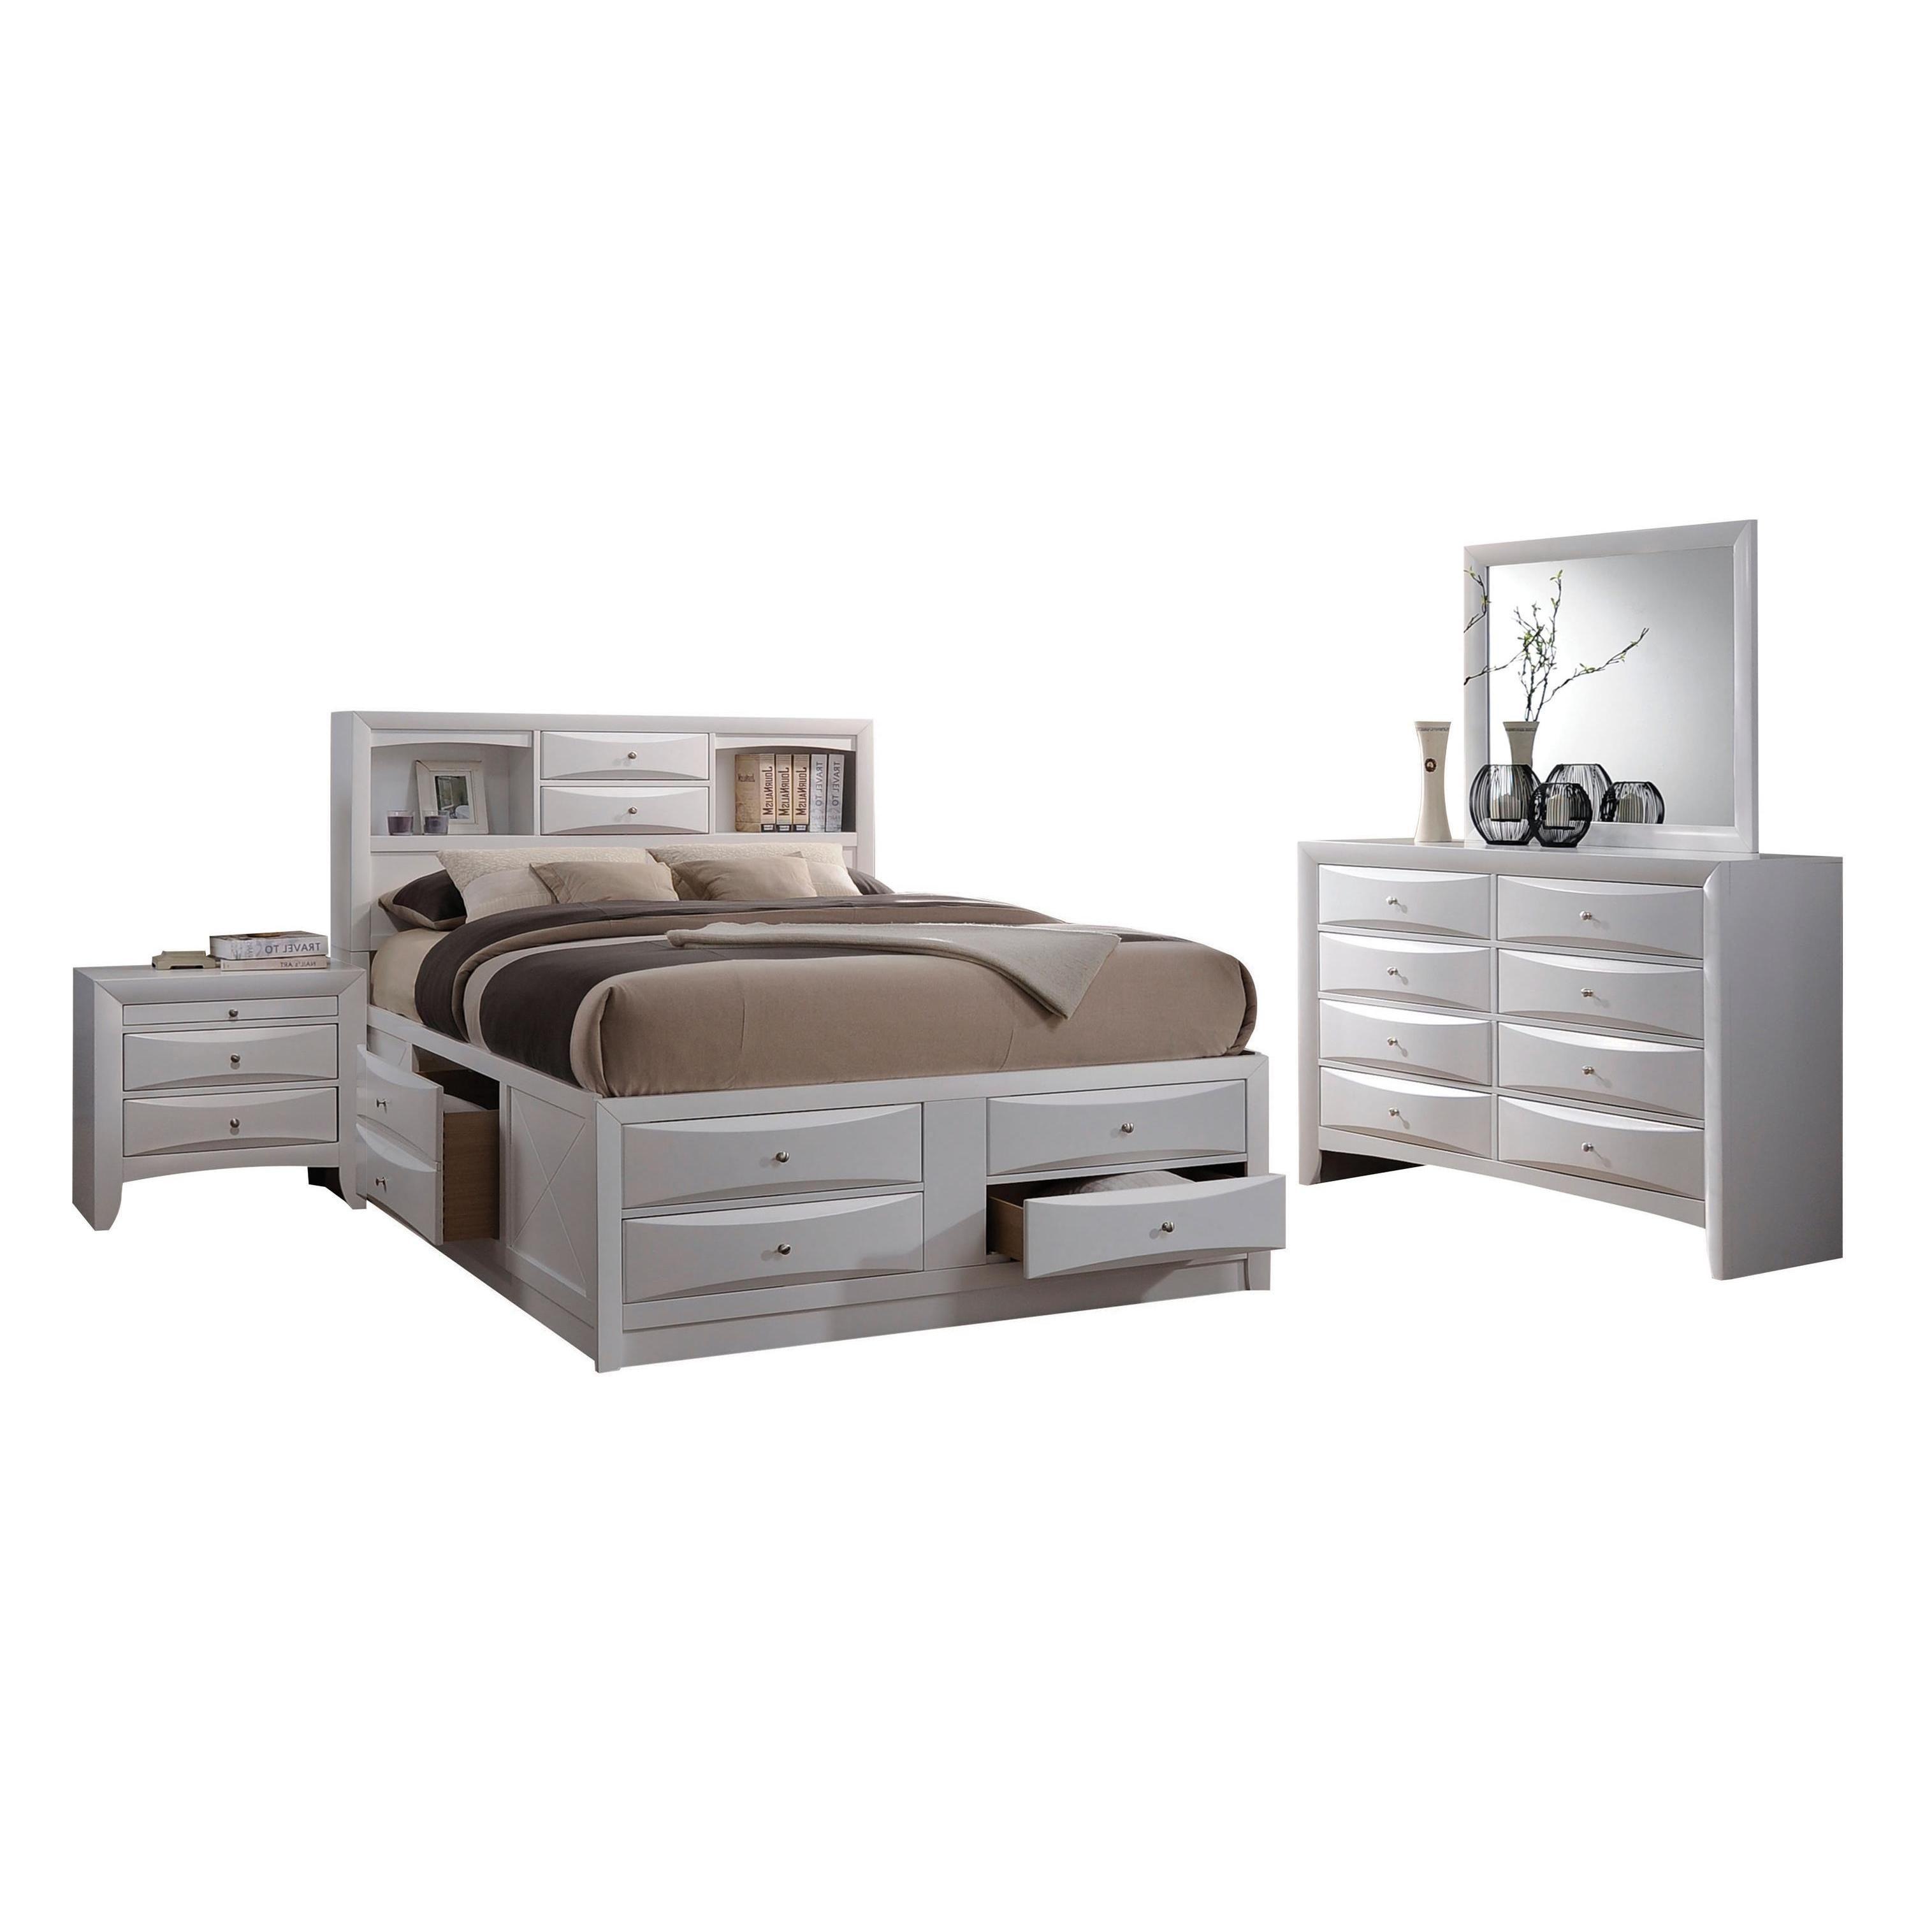 Acme Furniture Ireland 4Piece Storage Bedroom Set, White